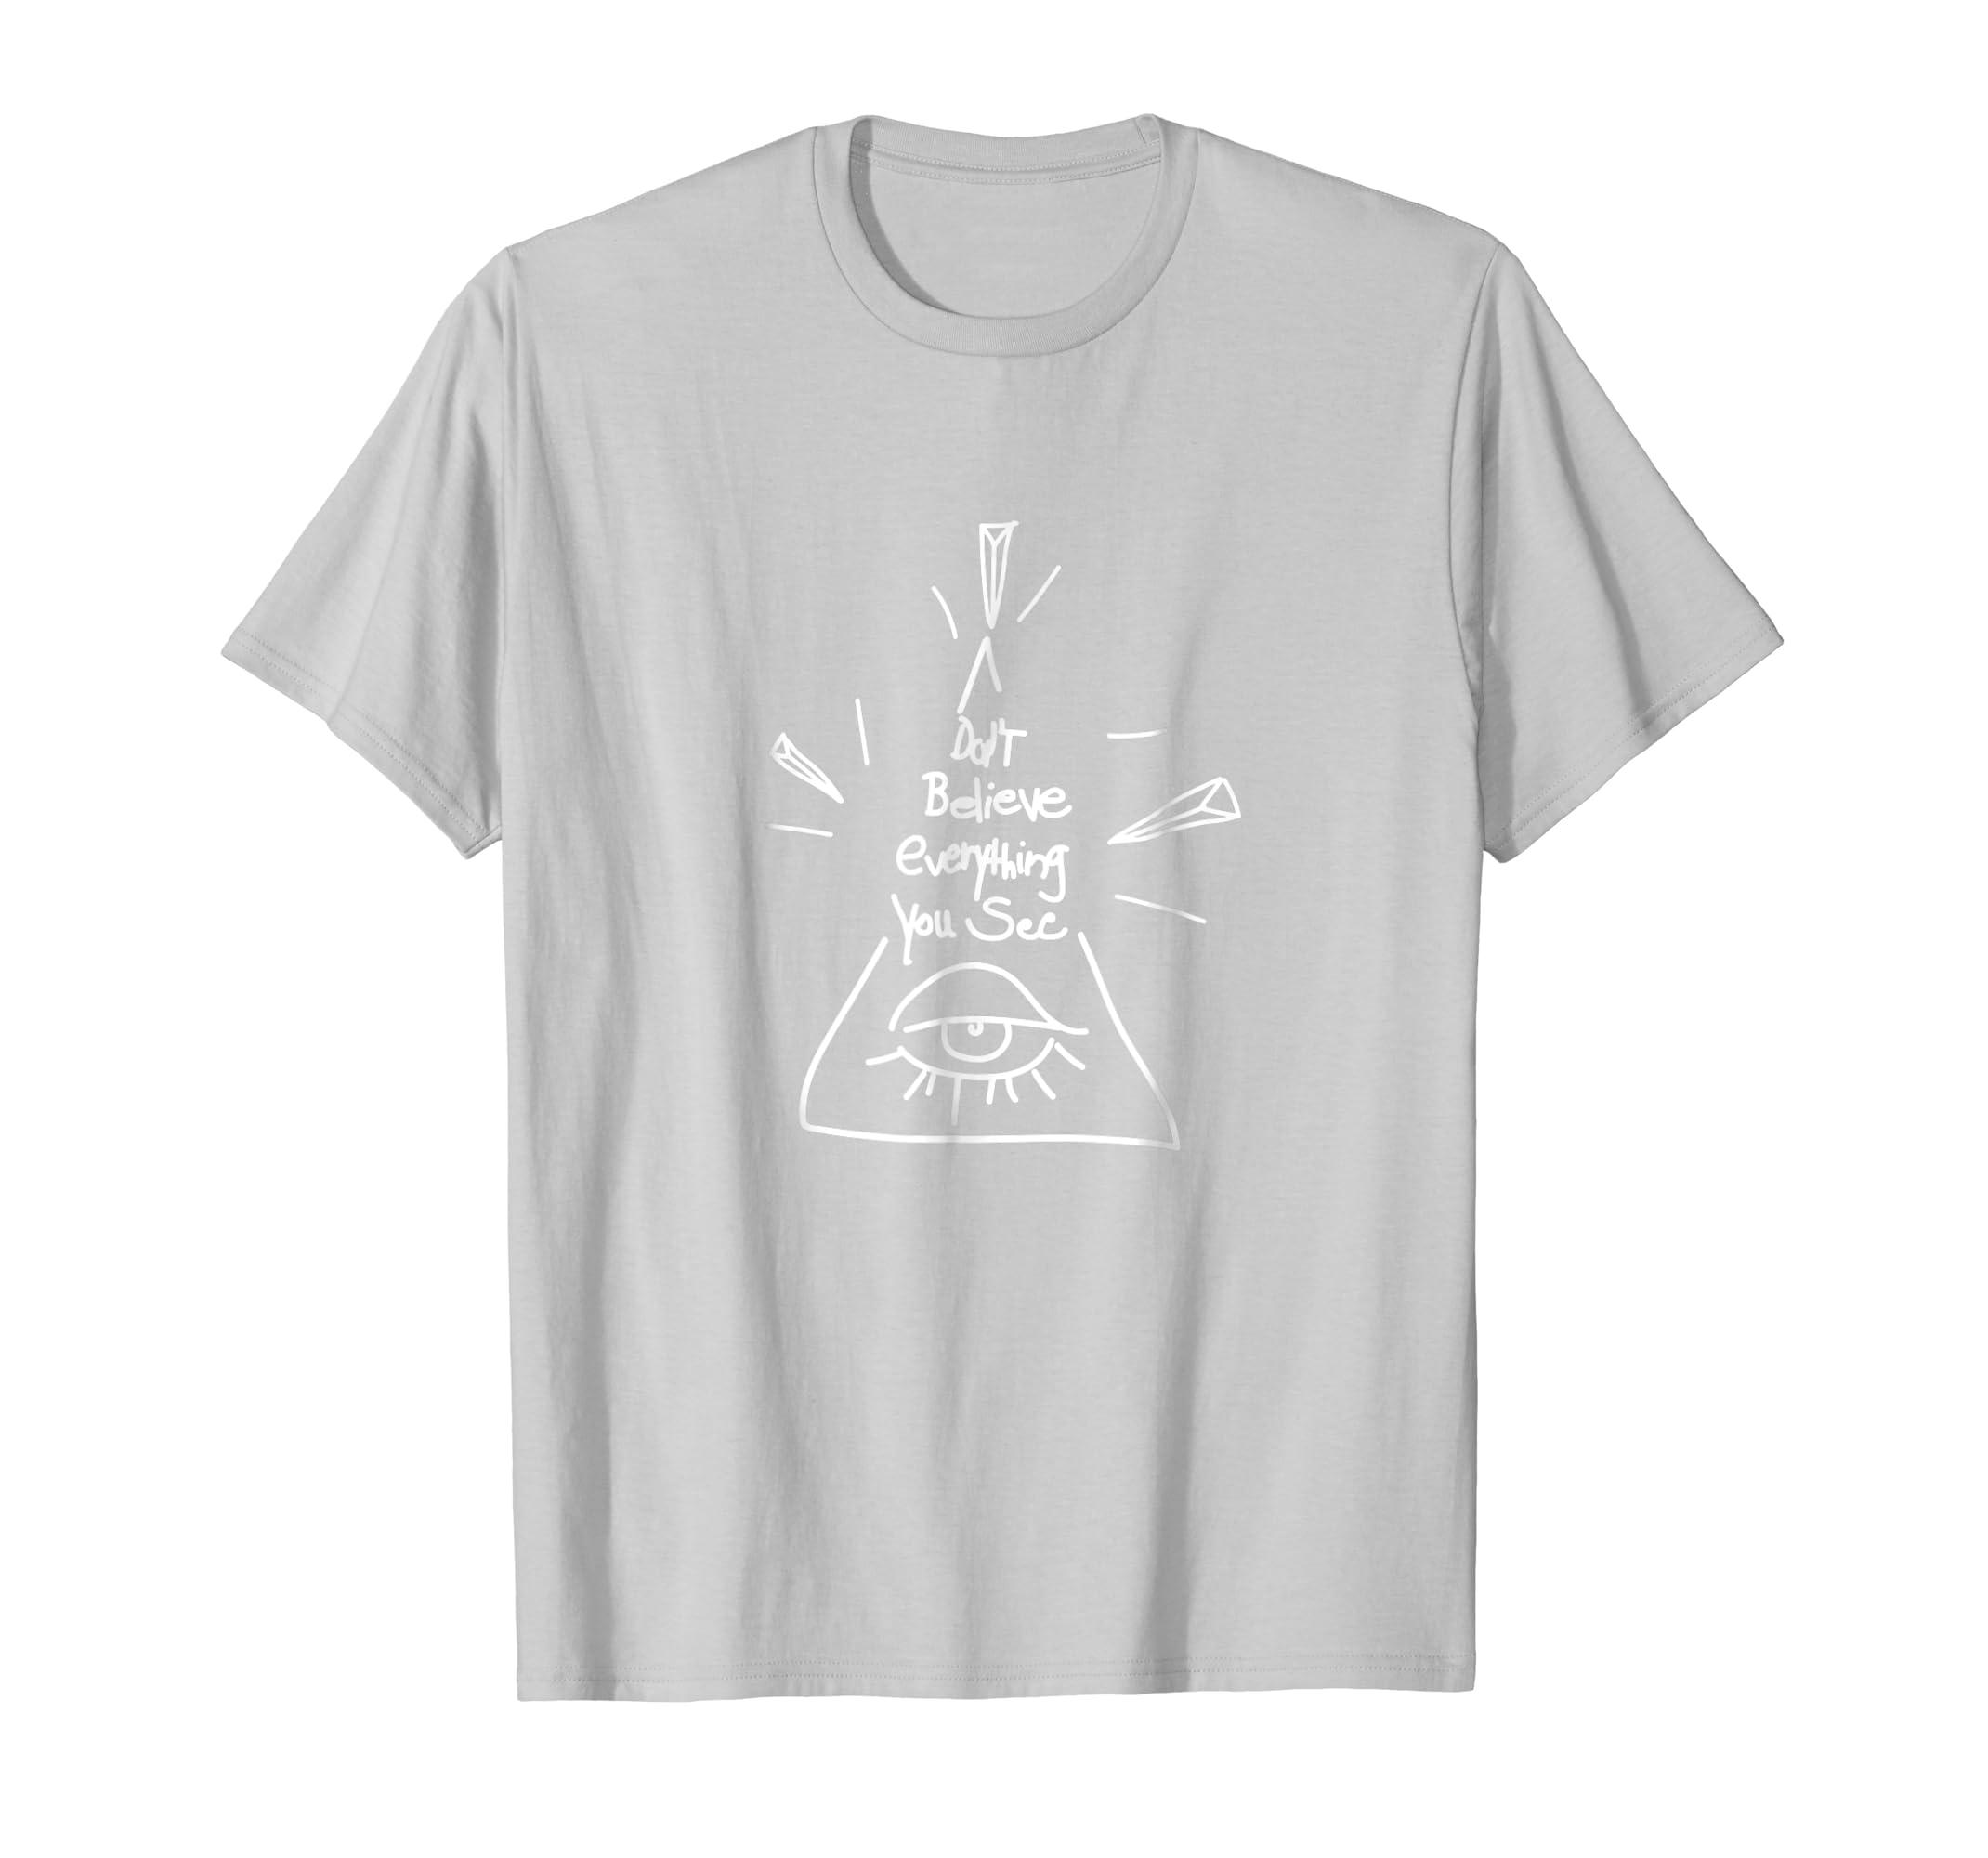 Shane Dawson Don't Believe Everything You See T-shirt-Loveshirt